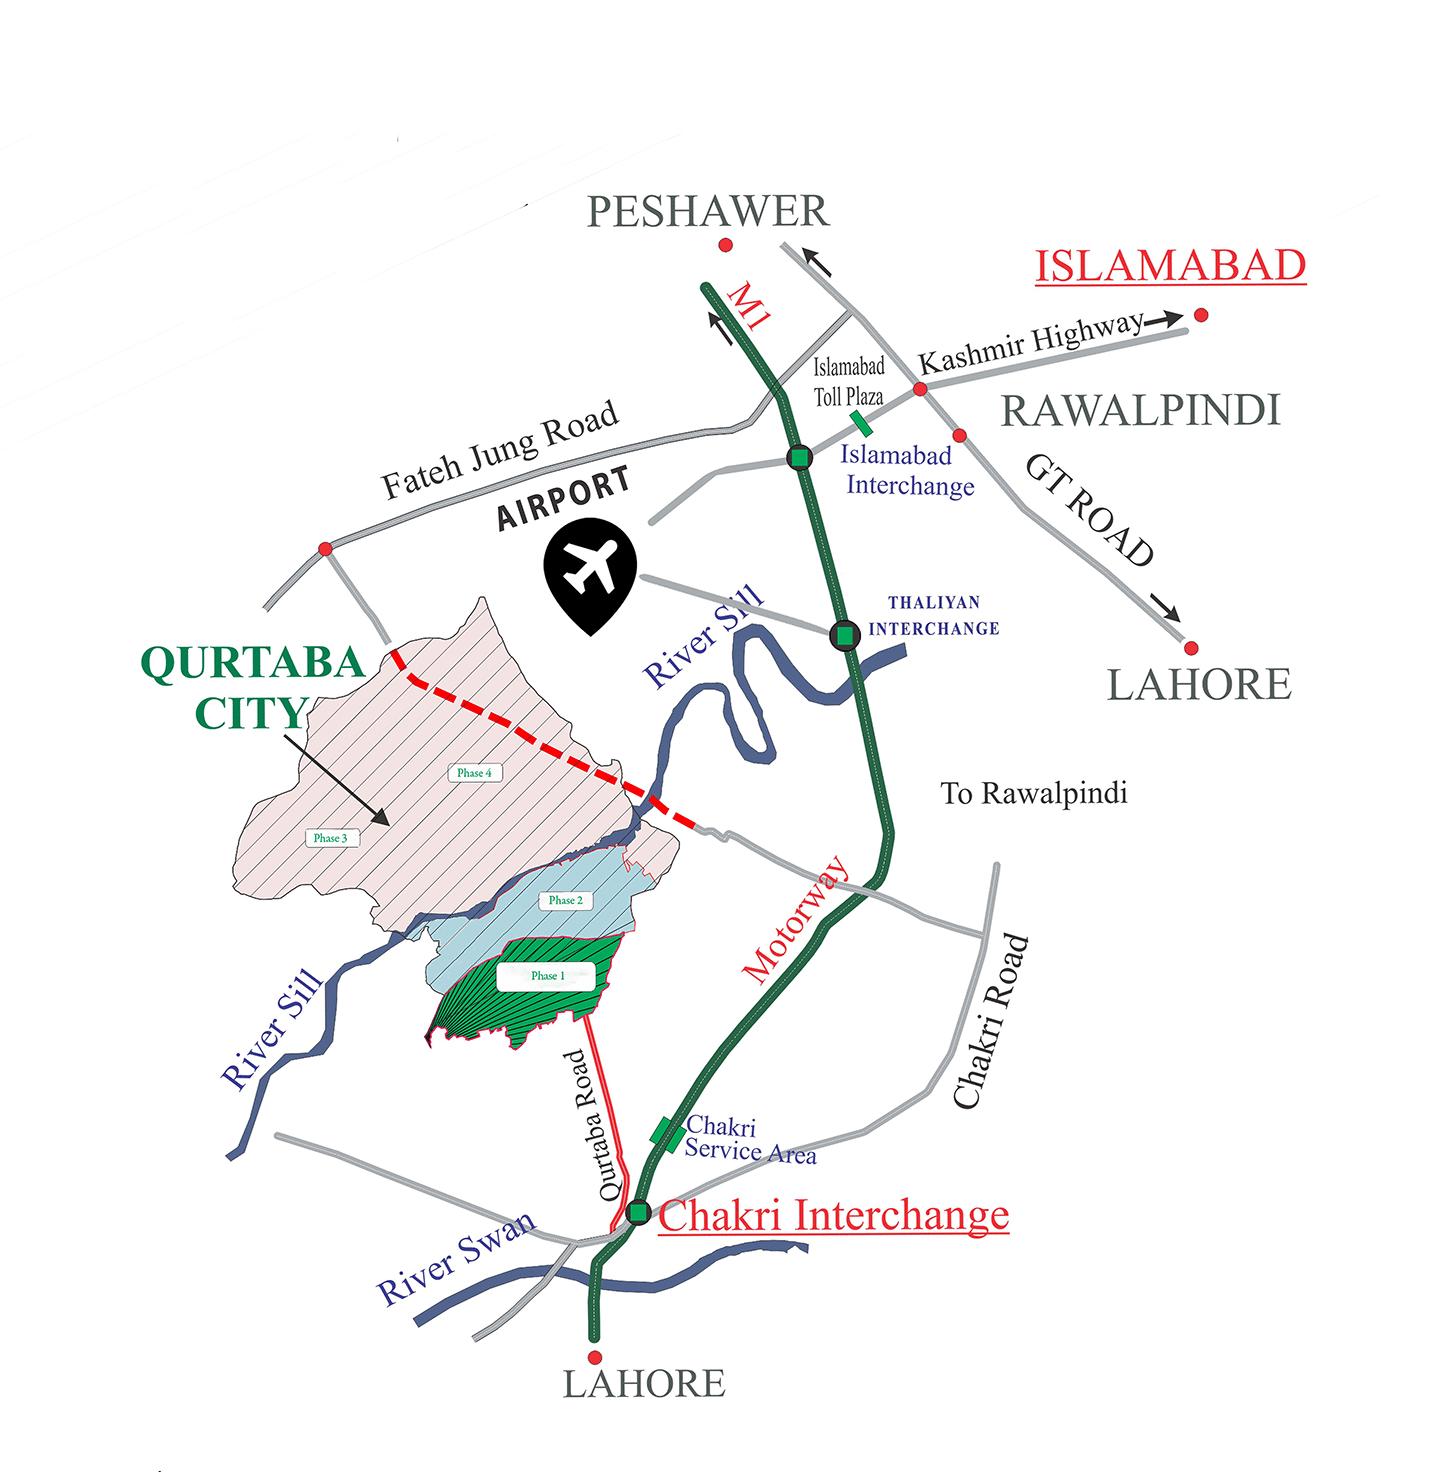 location map of qurtaba city